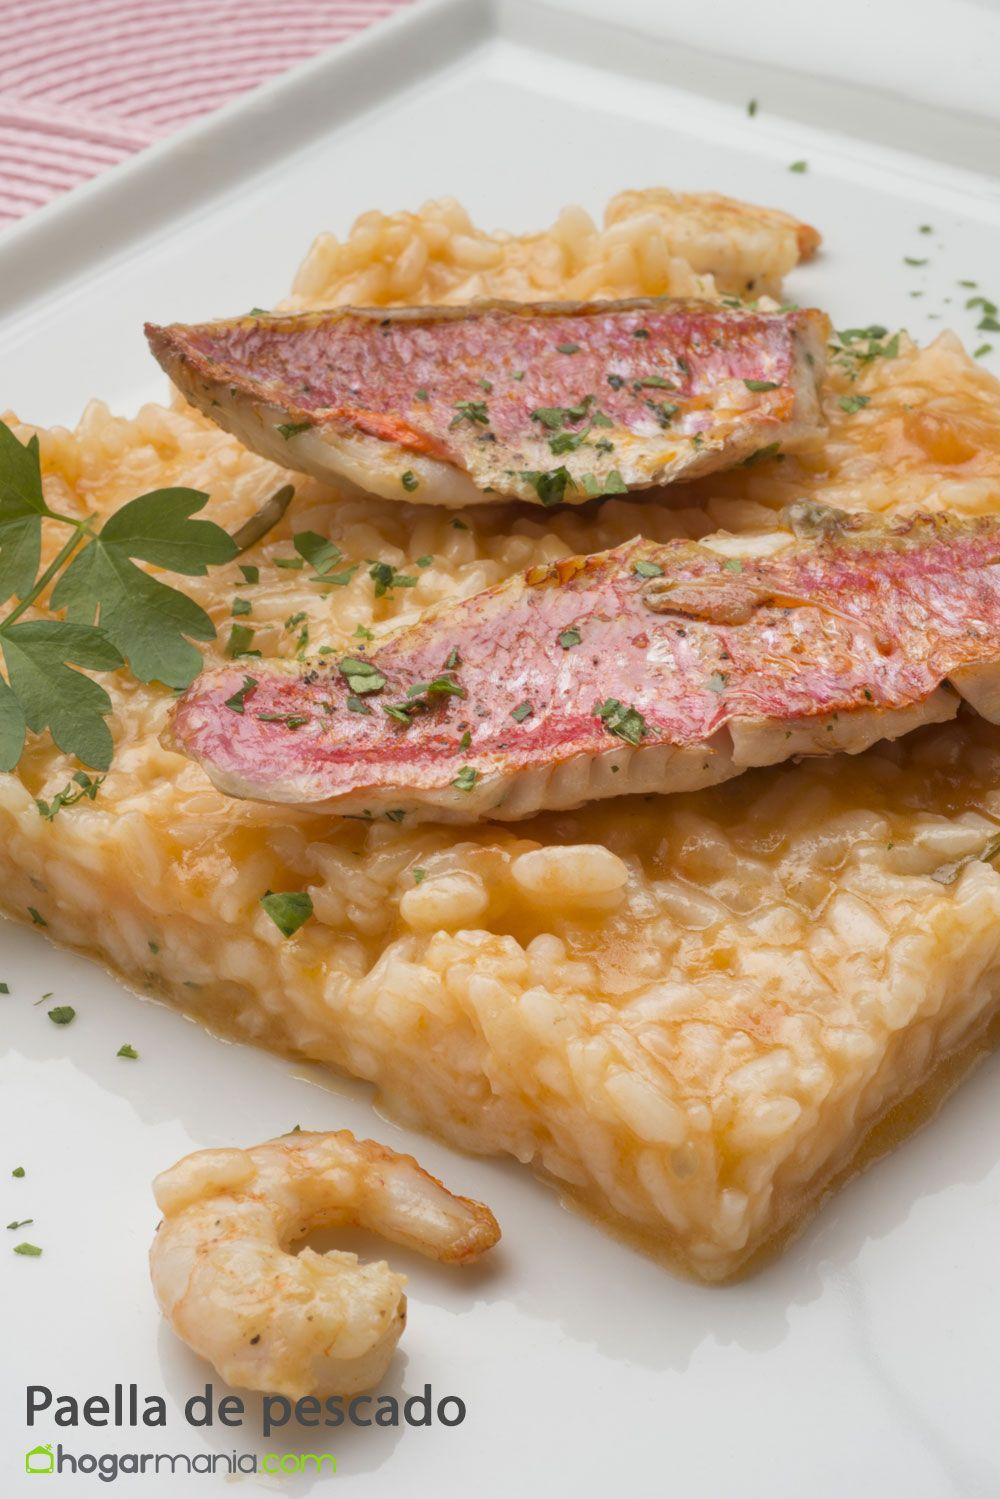 Receta de paella de pescado karlos argui ano - Paella de pescado ...